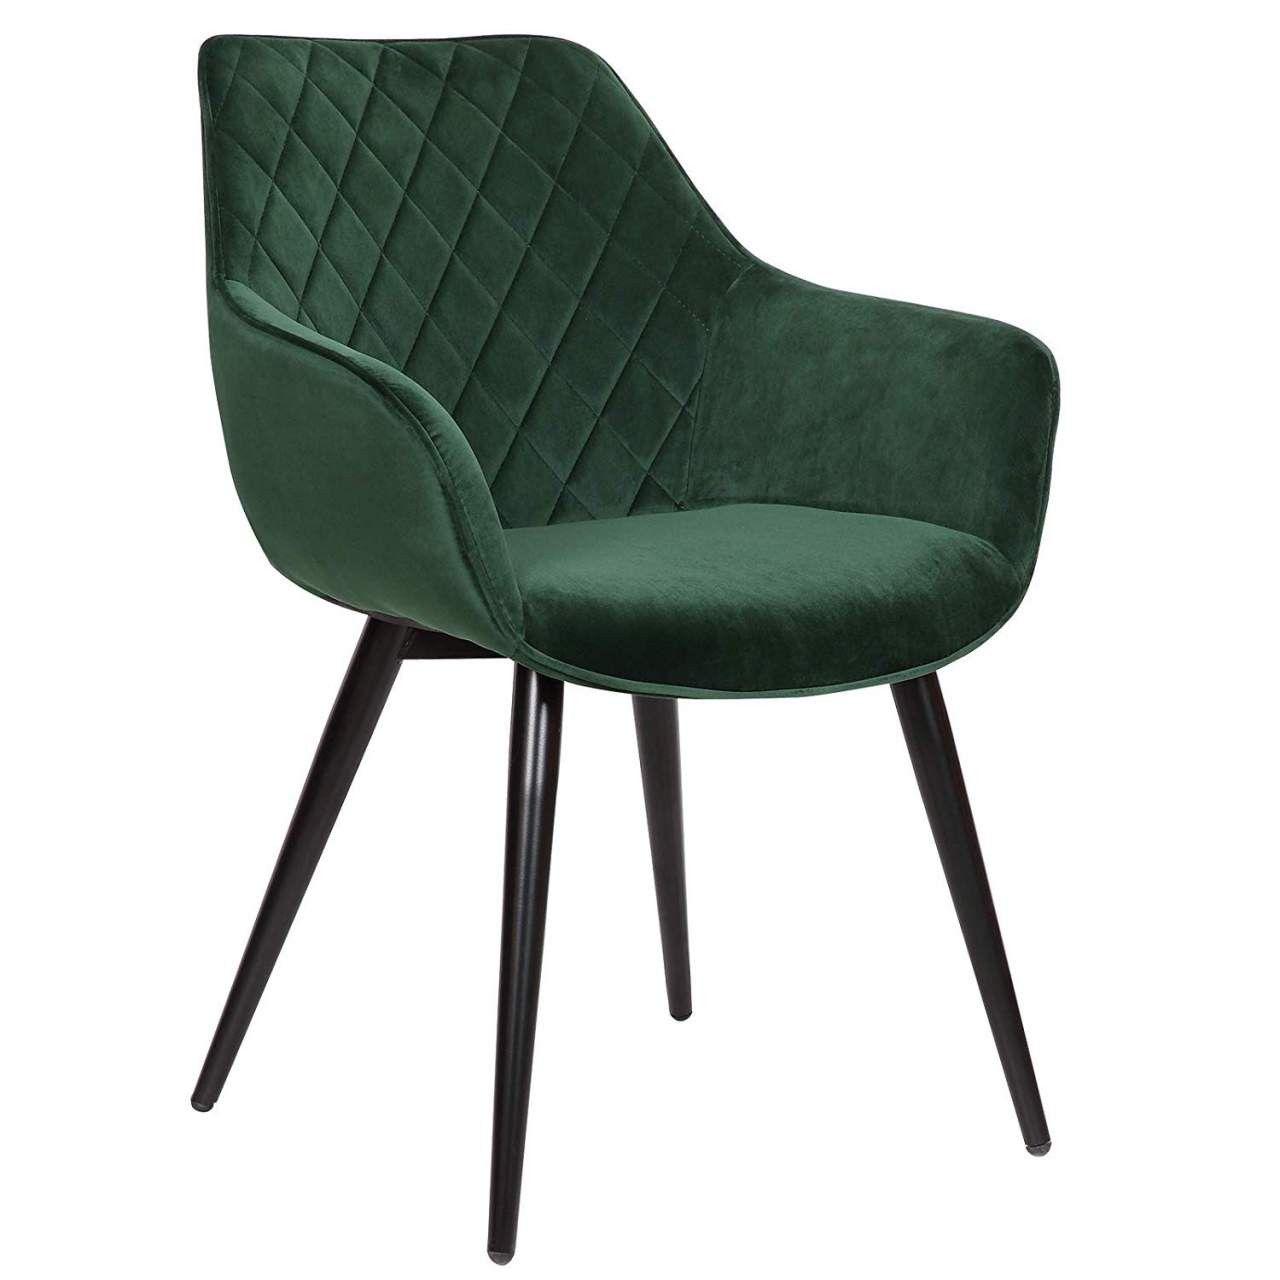 Wohnzimmerstuhl aus Samtbezug & Metall Beca : grün Farbe: grün